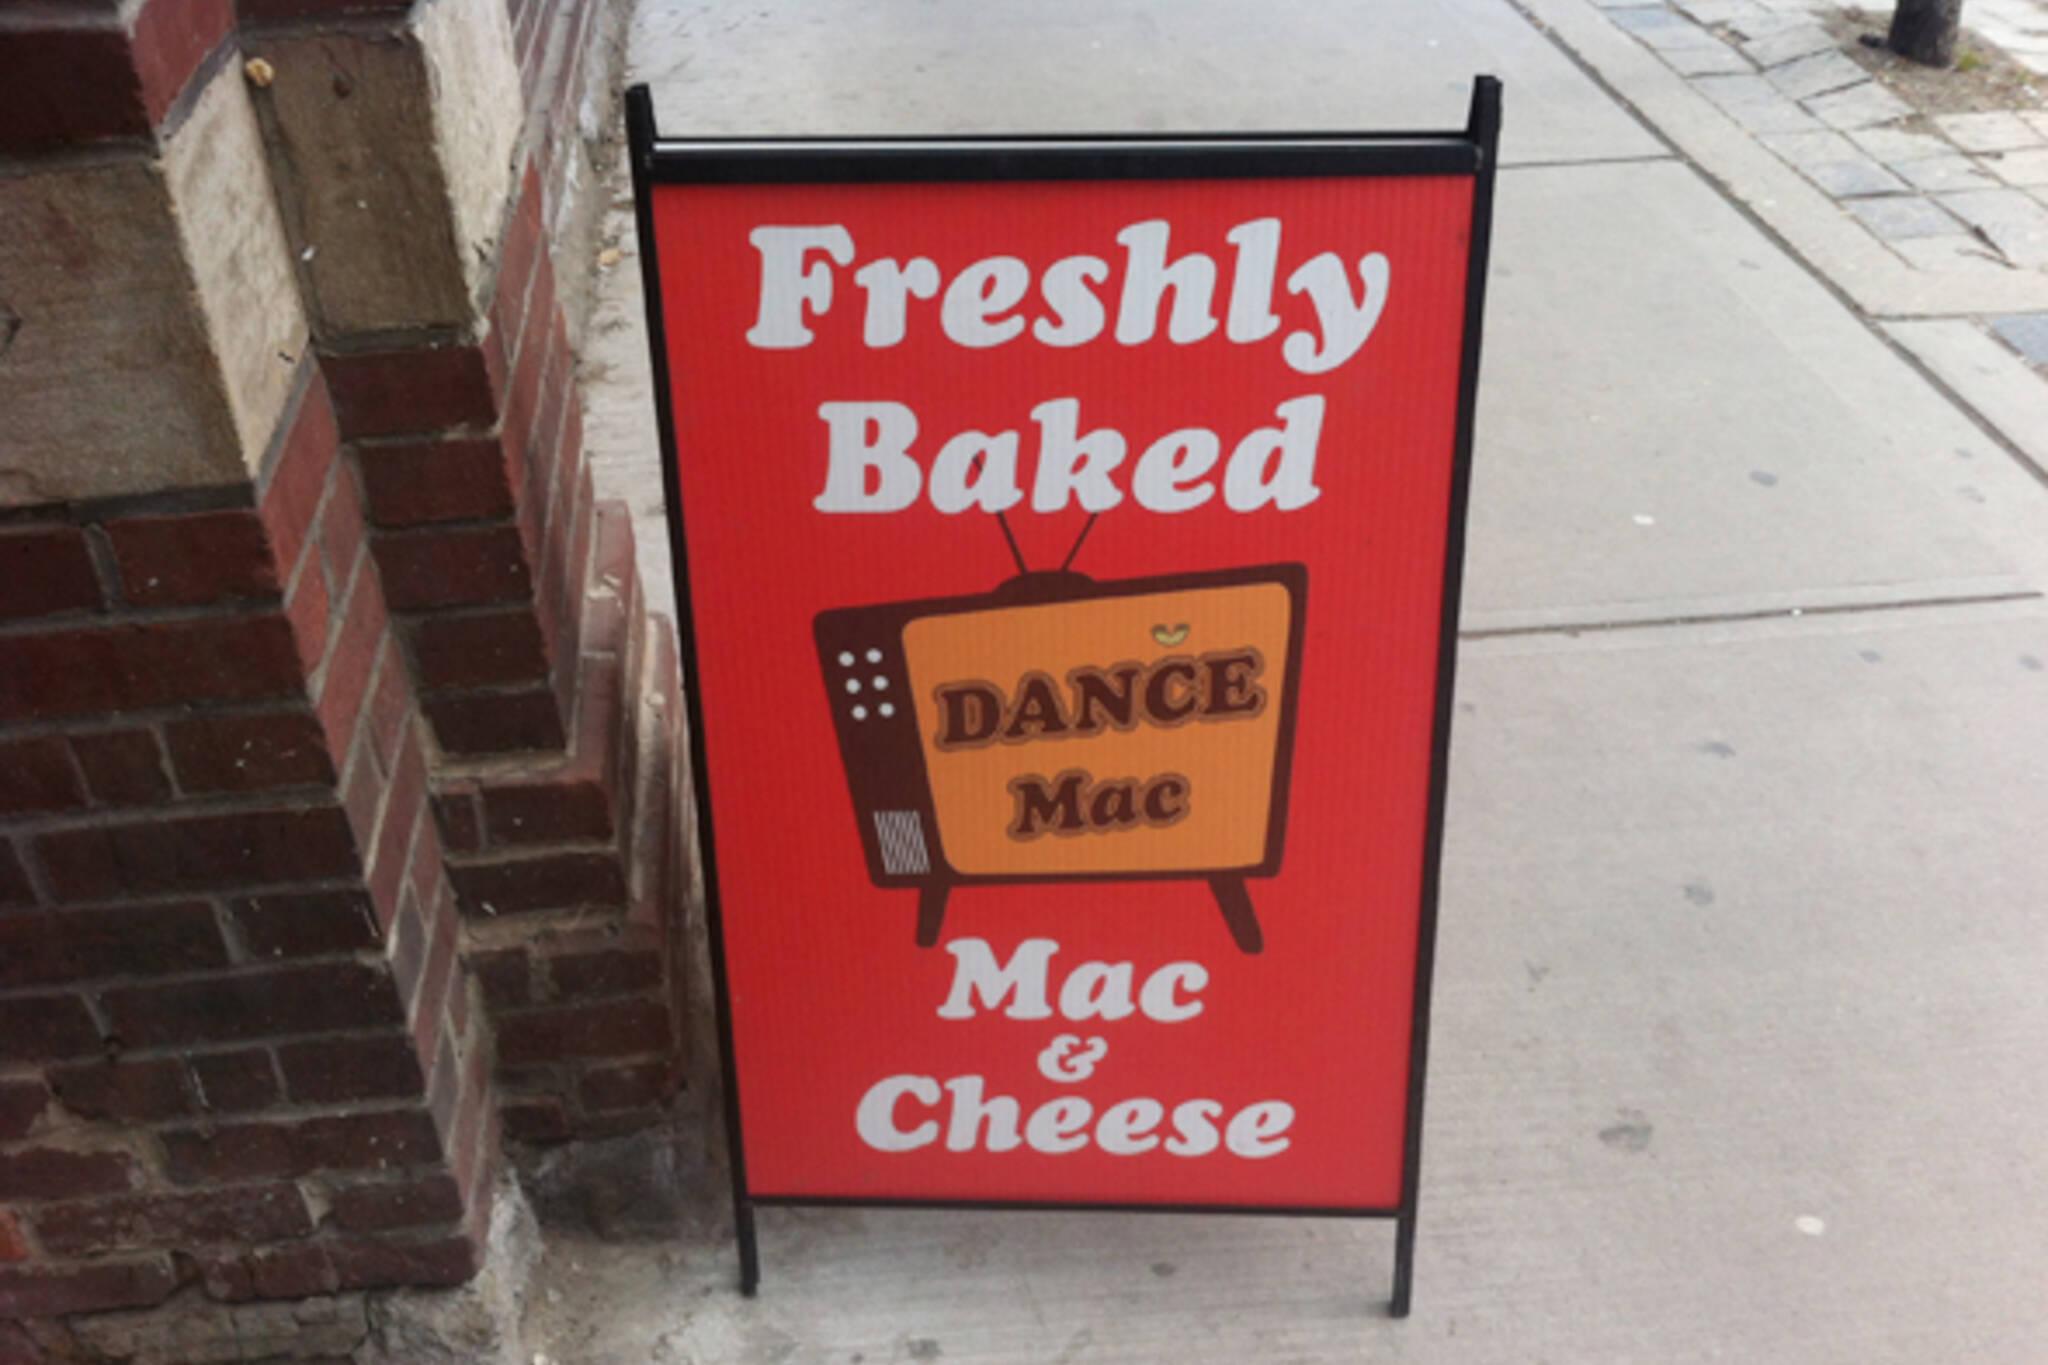 Dance Mac Toronto